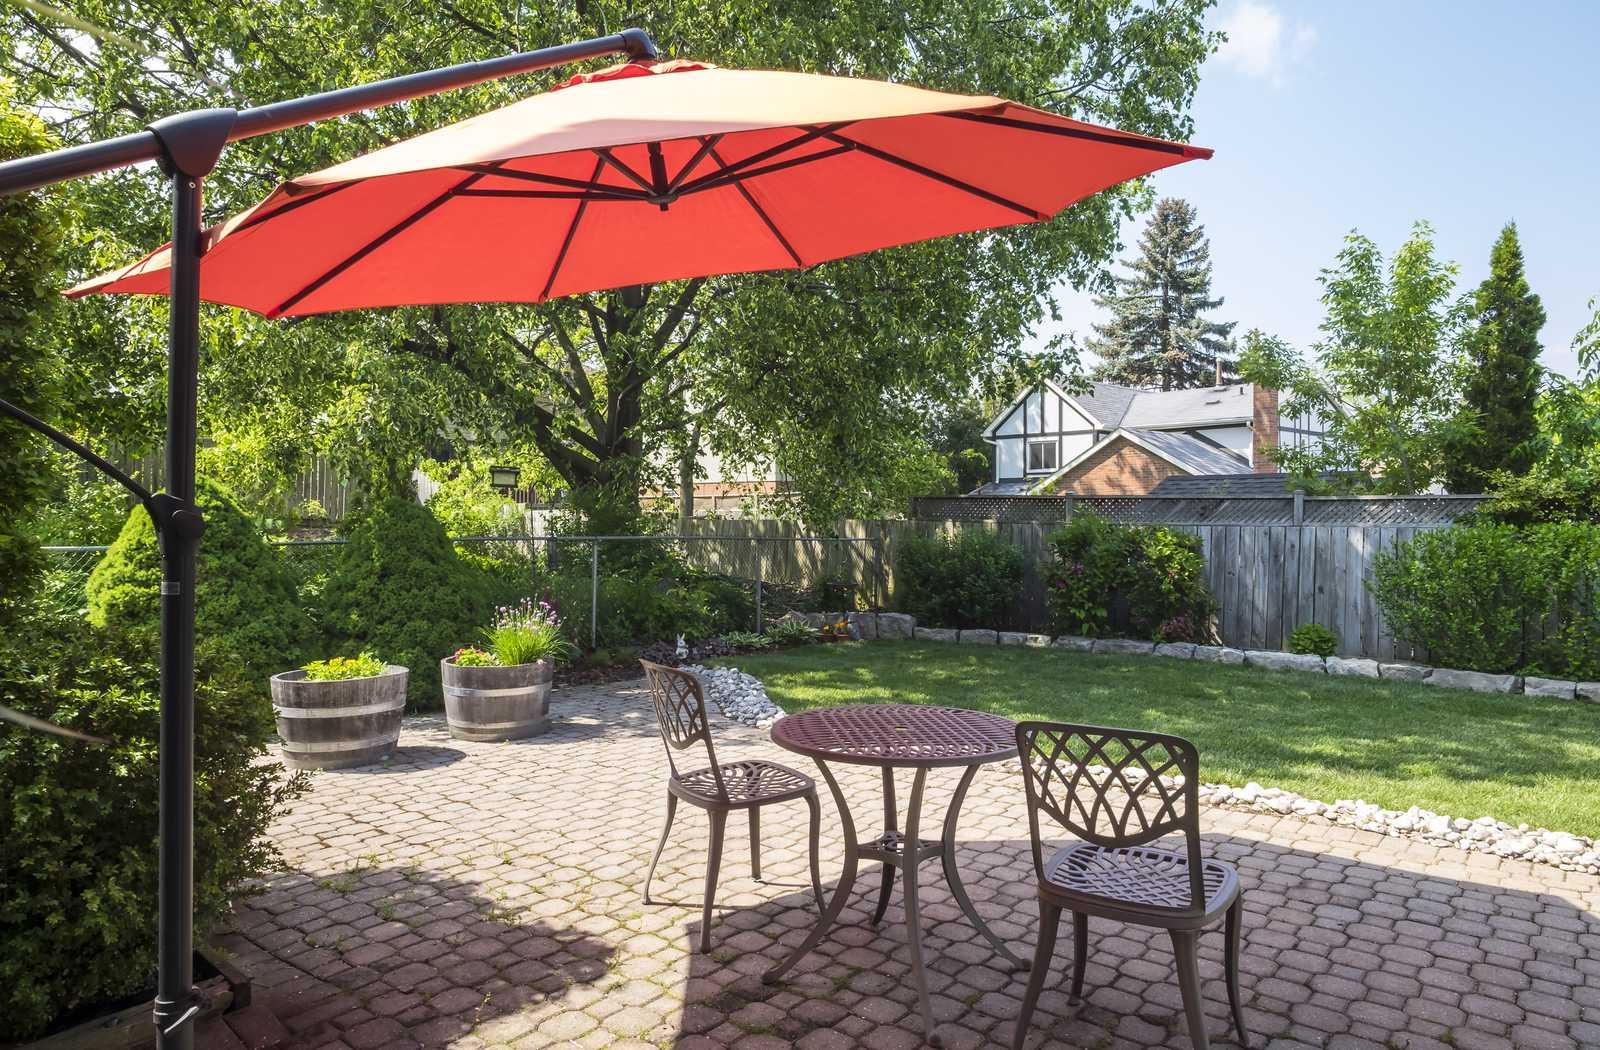 Cantilever orange umbrella shading bare patio furniture with greenery behind